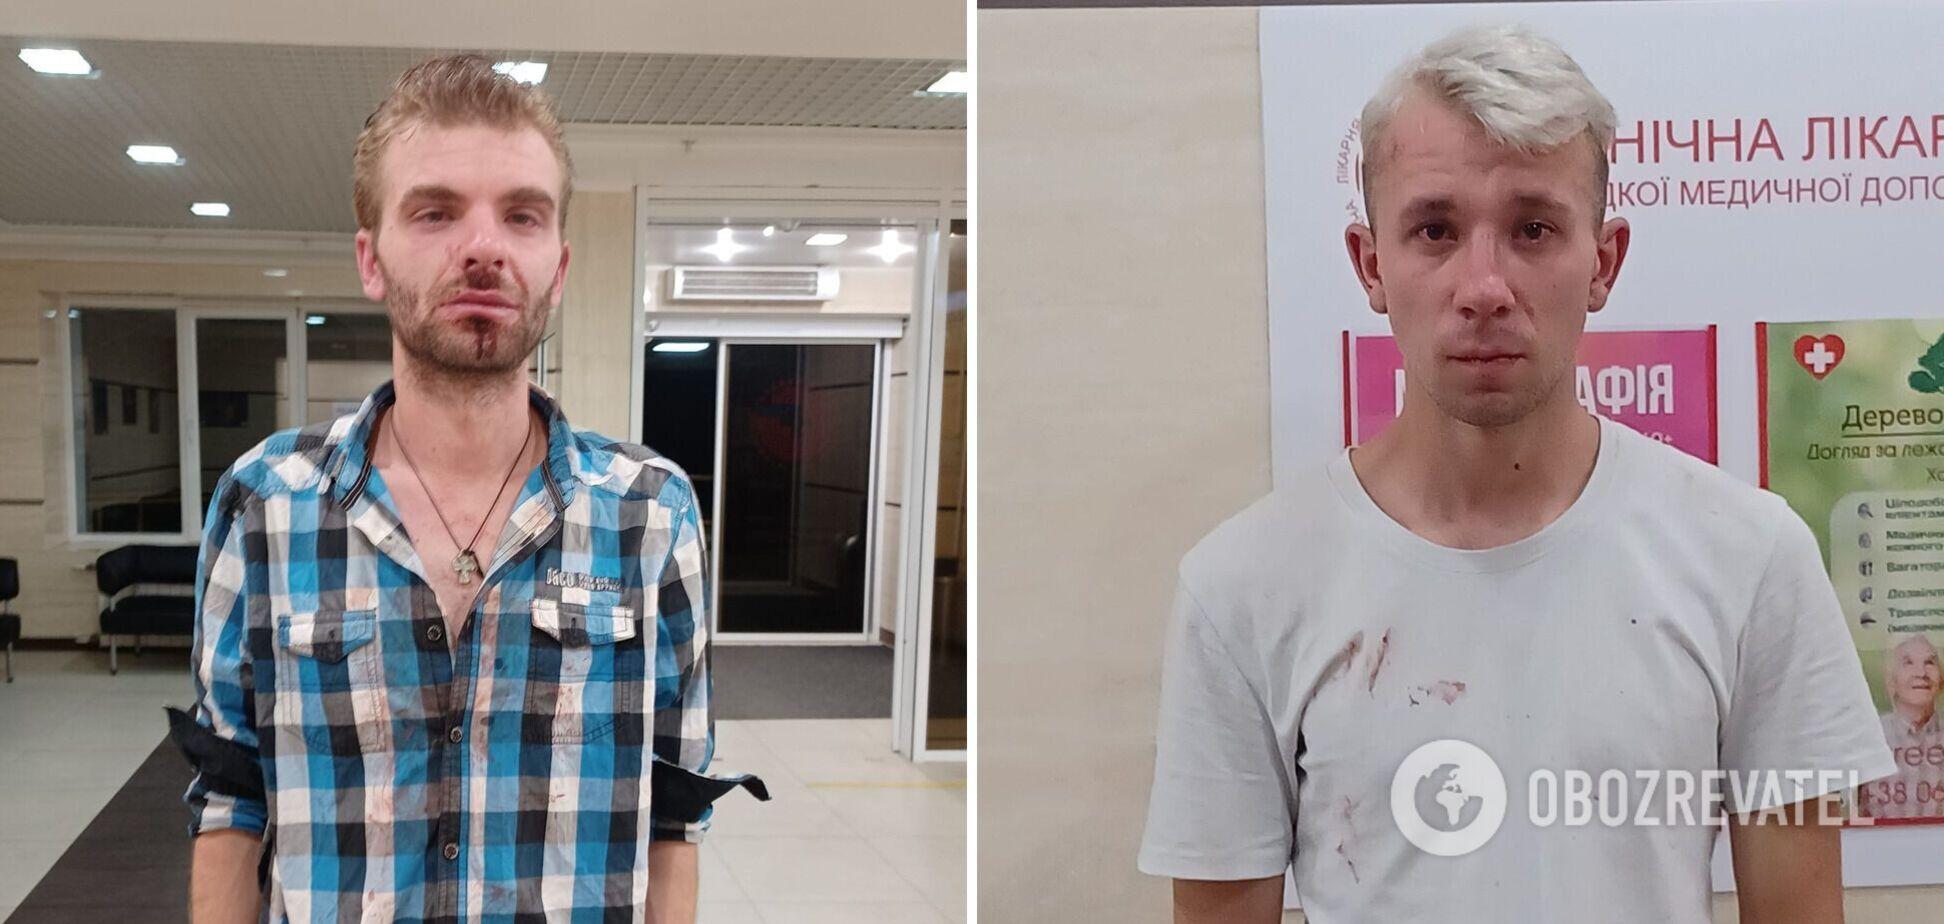 У Львові вчинили напад на вуличного музиканта та поета: залили балончиком та побили. Фото